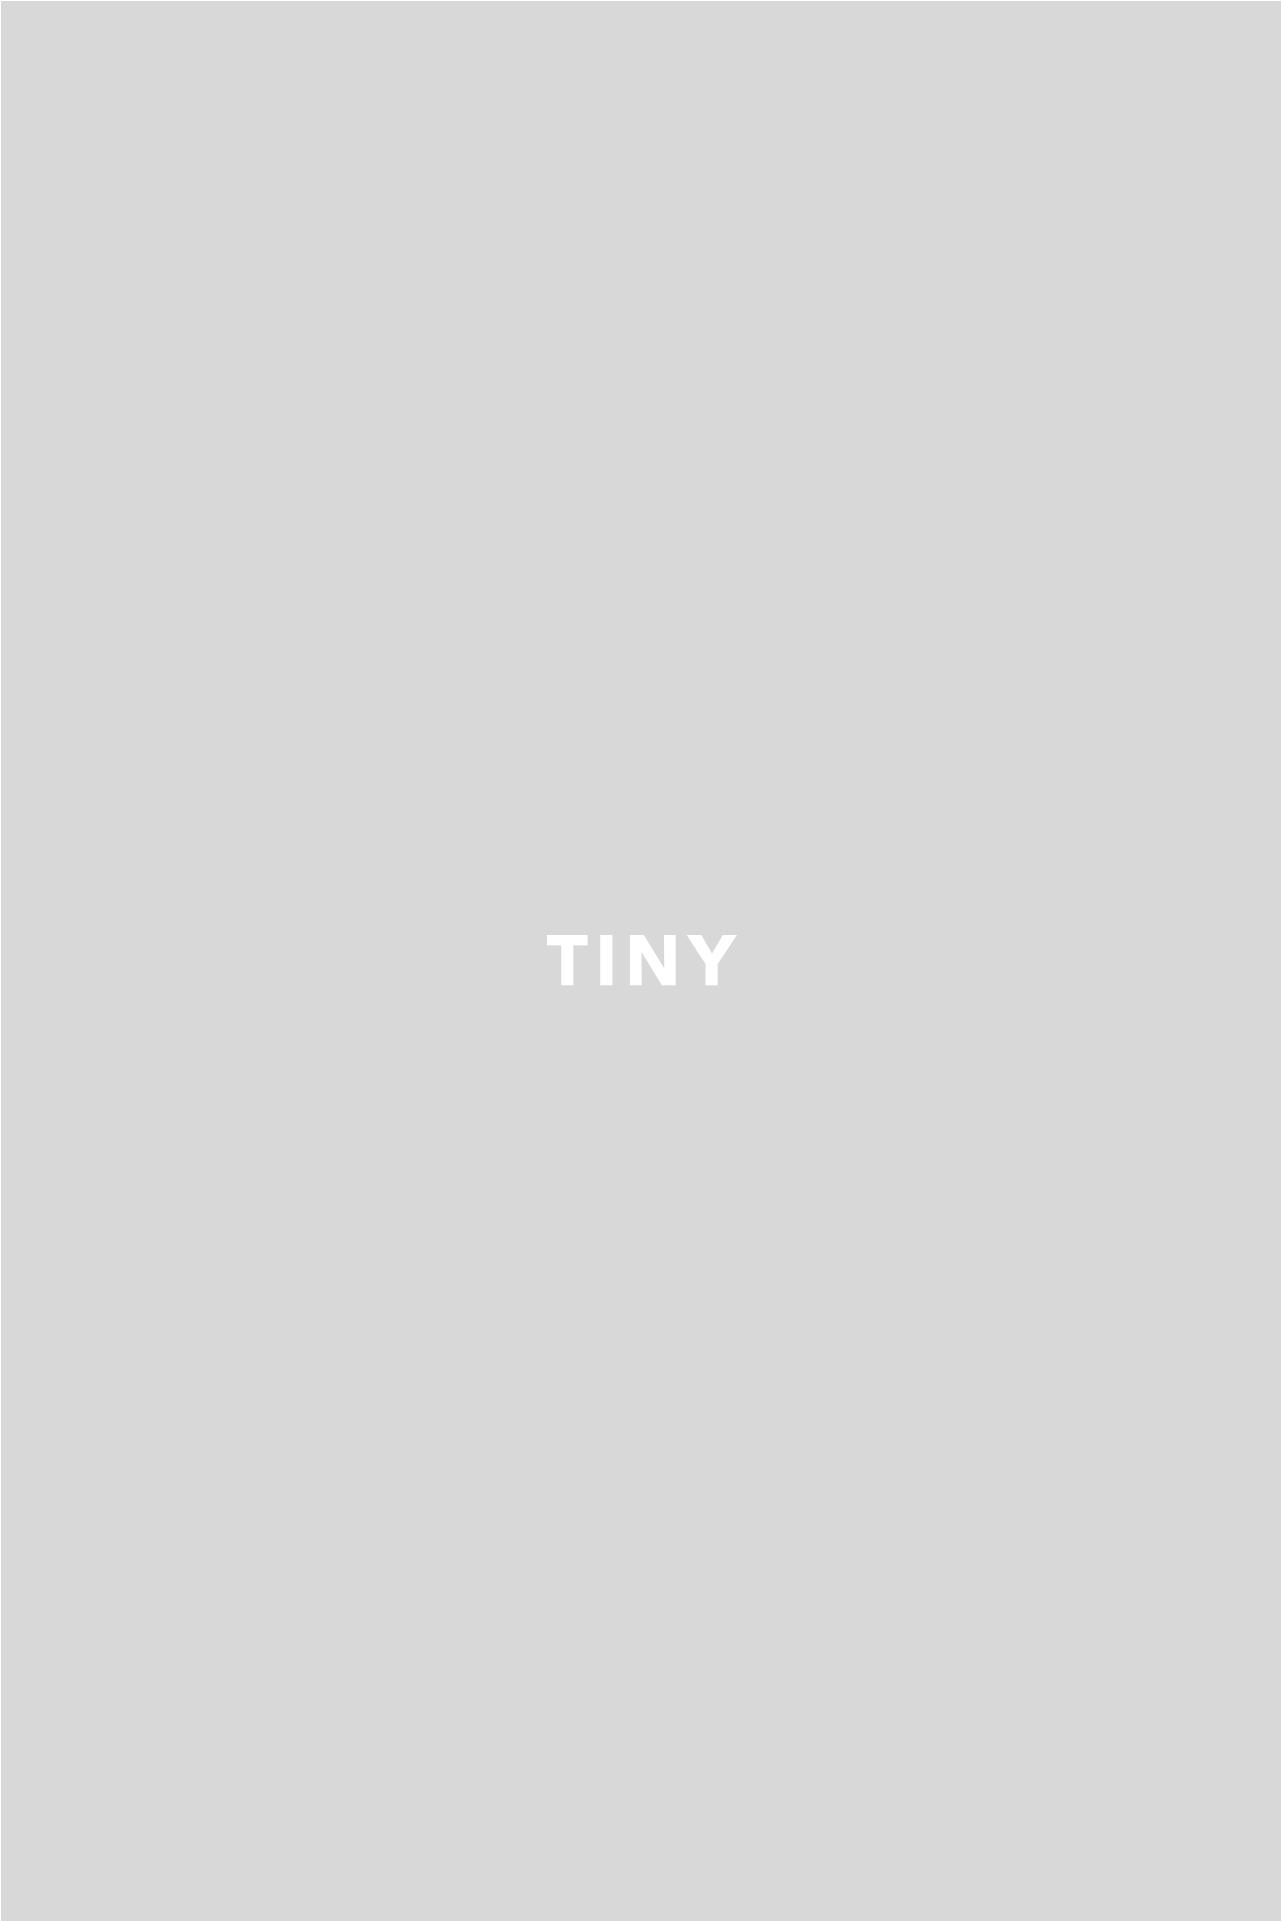 Candy set - 15-set